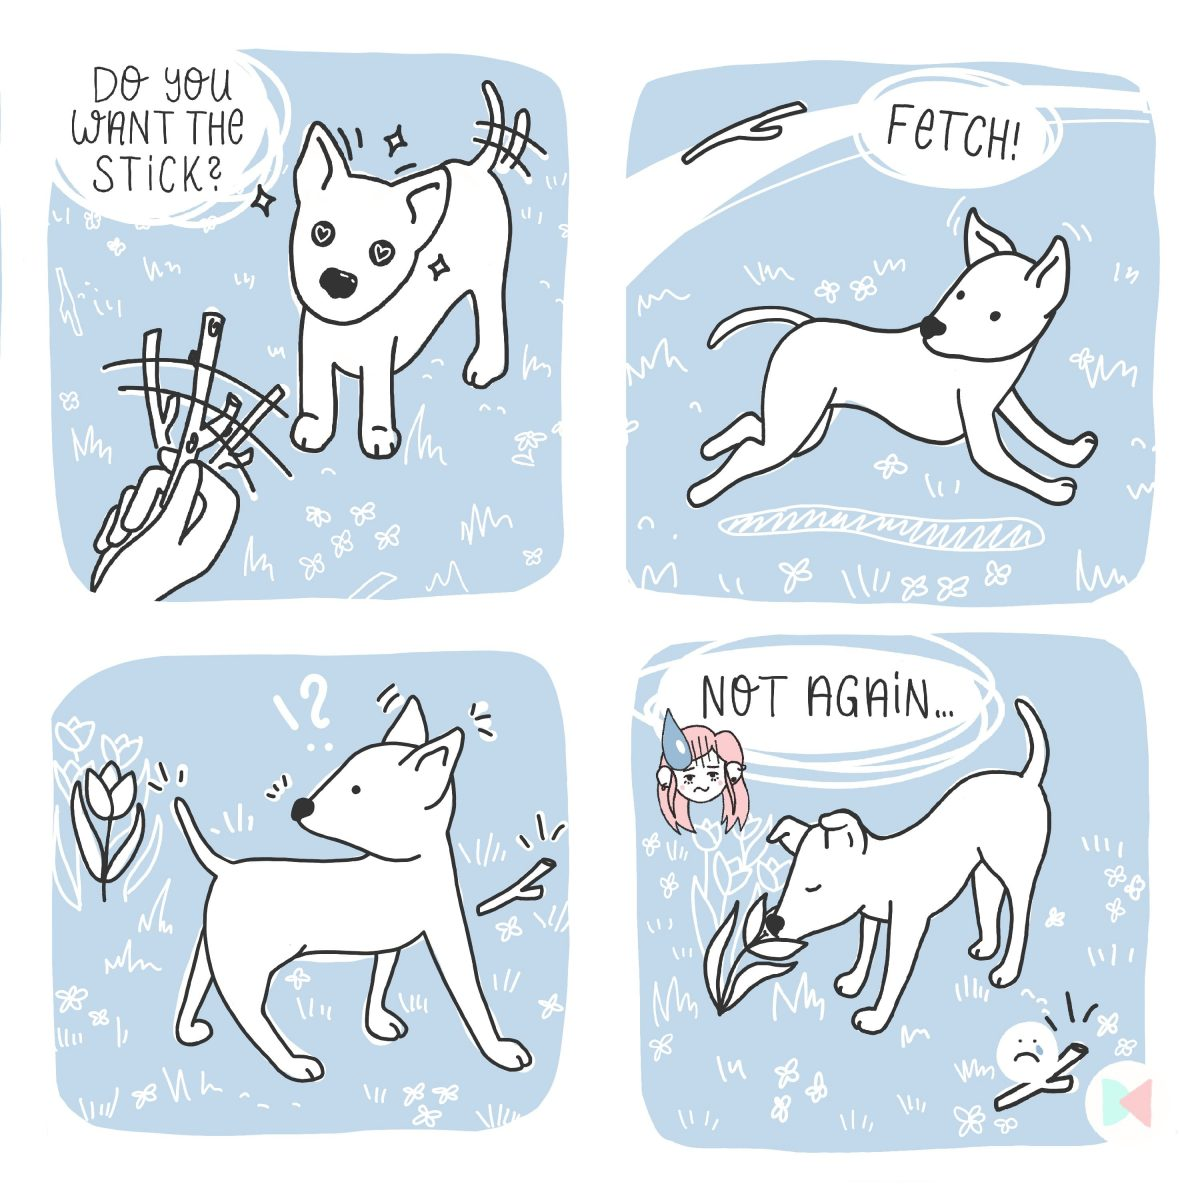 Stick Fetching Comic